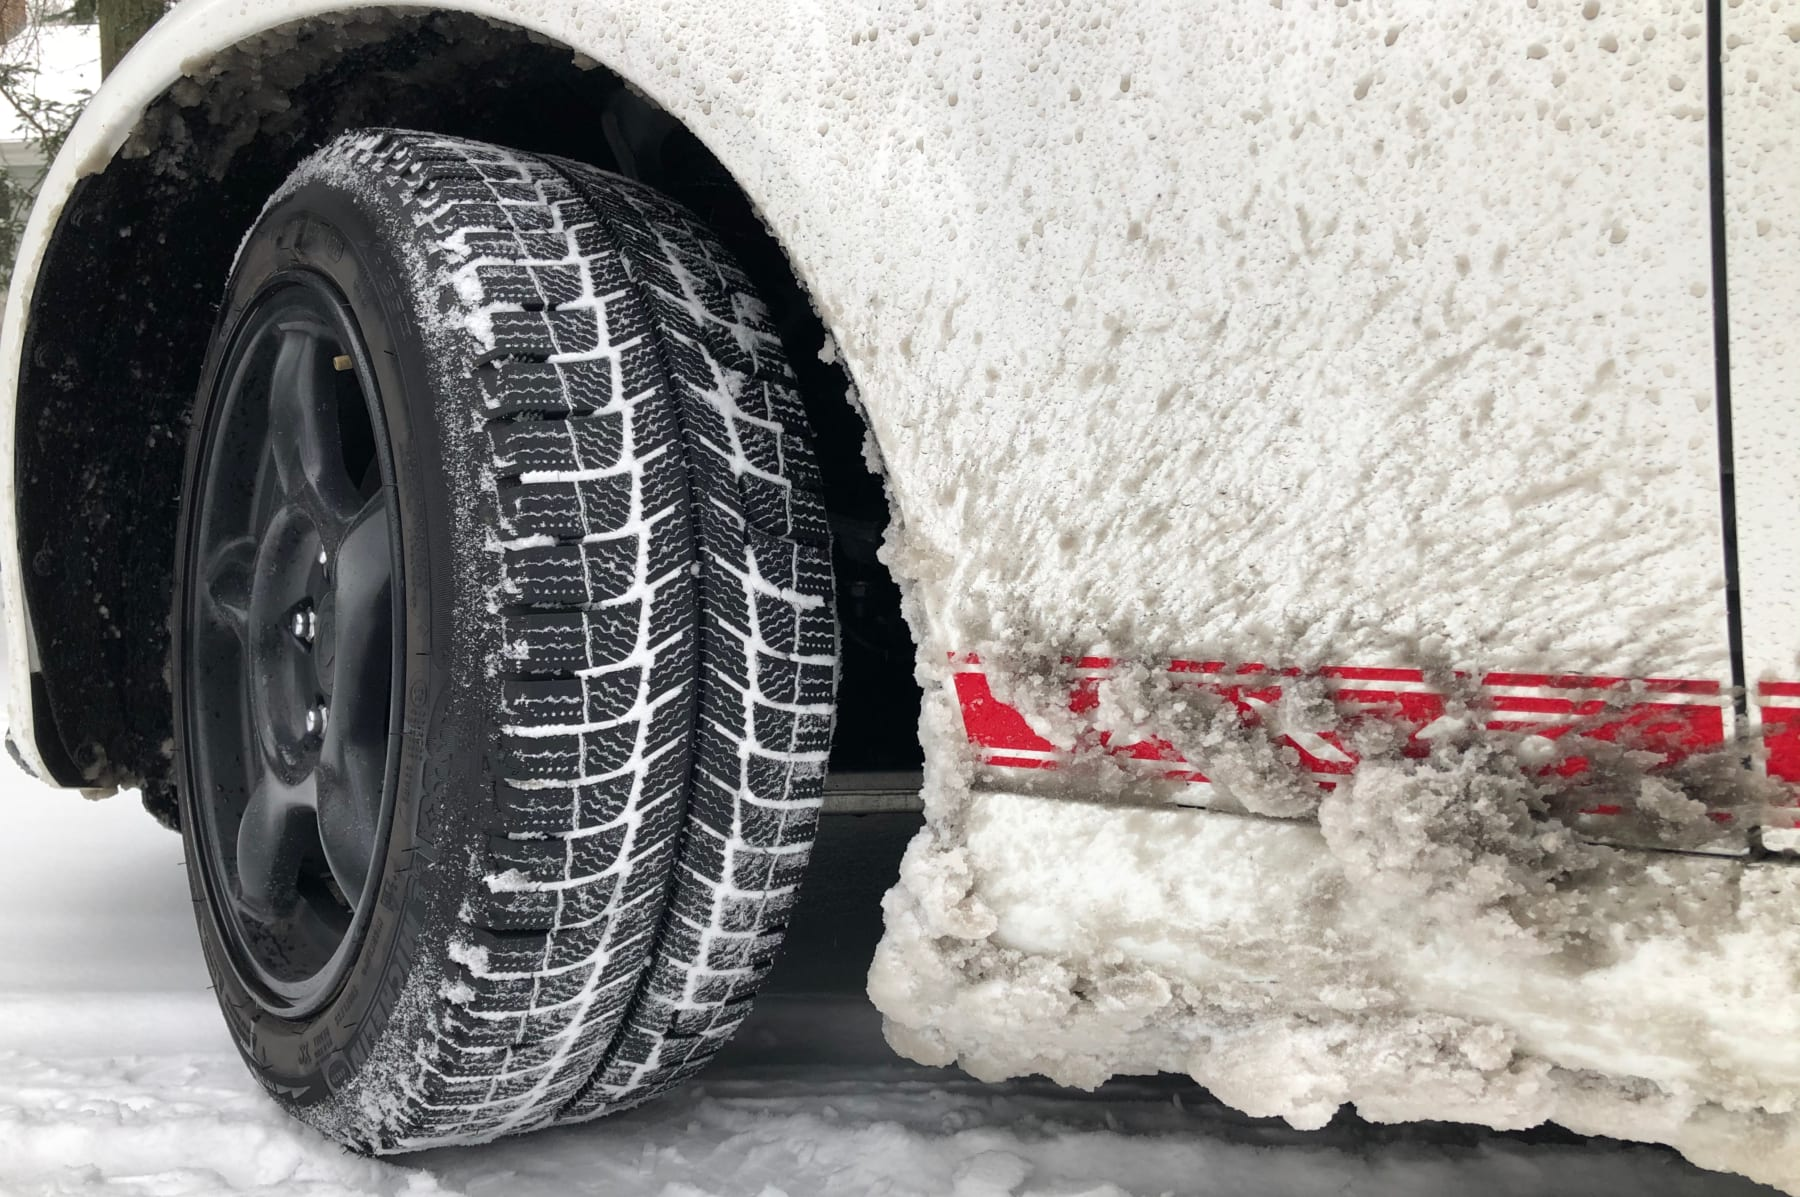 2013 Mazda Miata Club PRHT 6MT / Michelin X-Ice Xi3